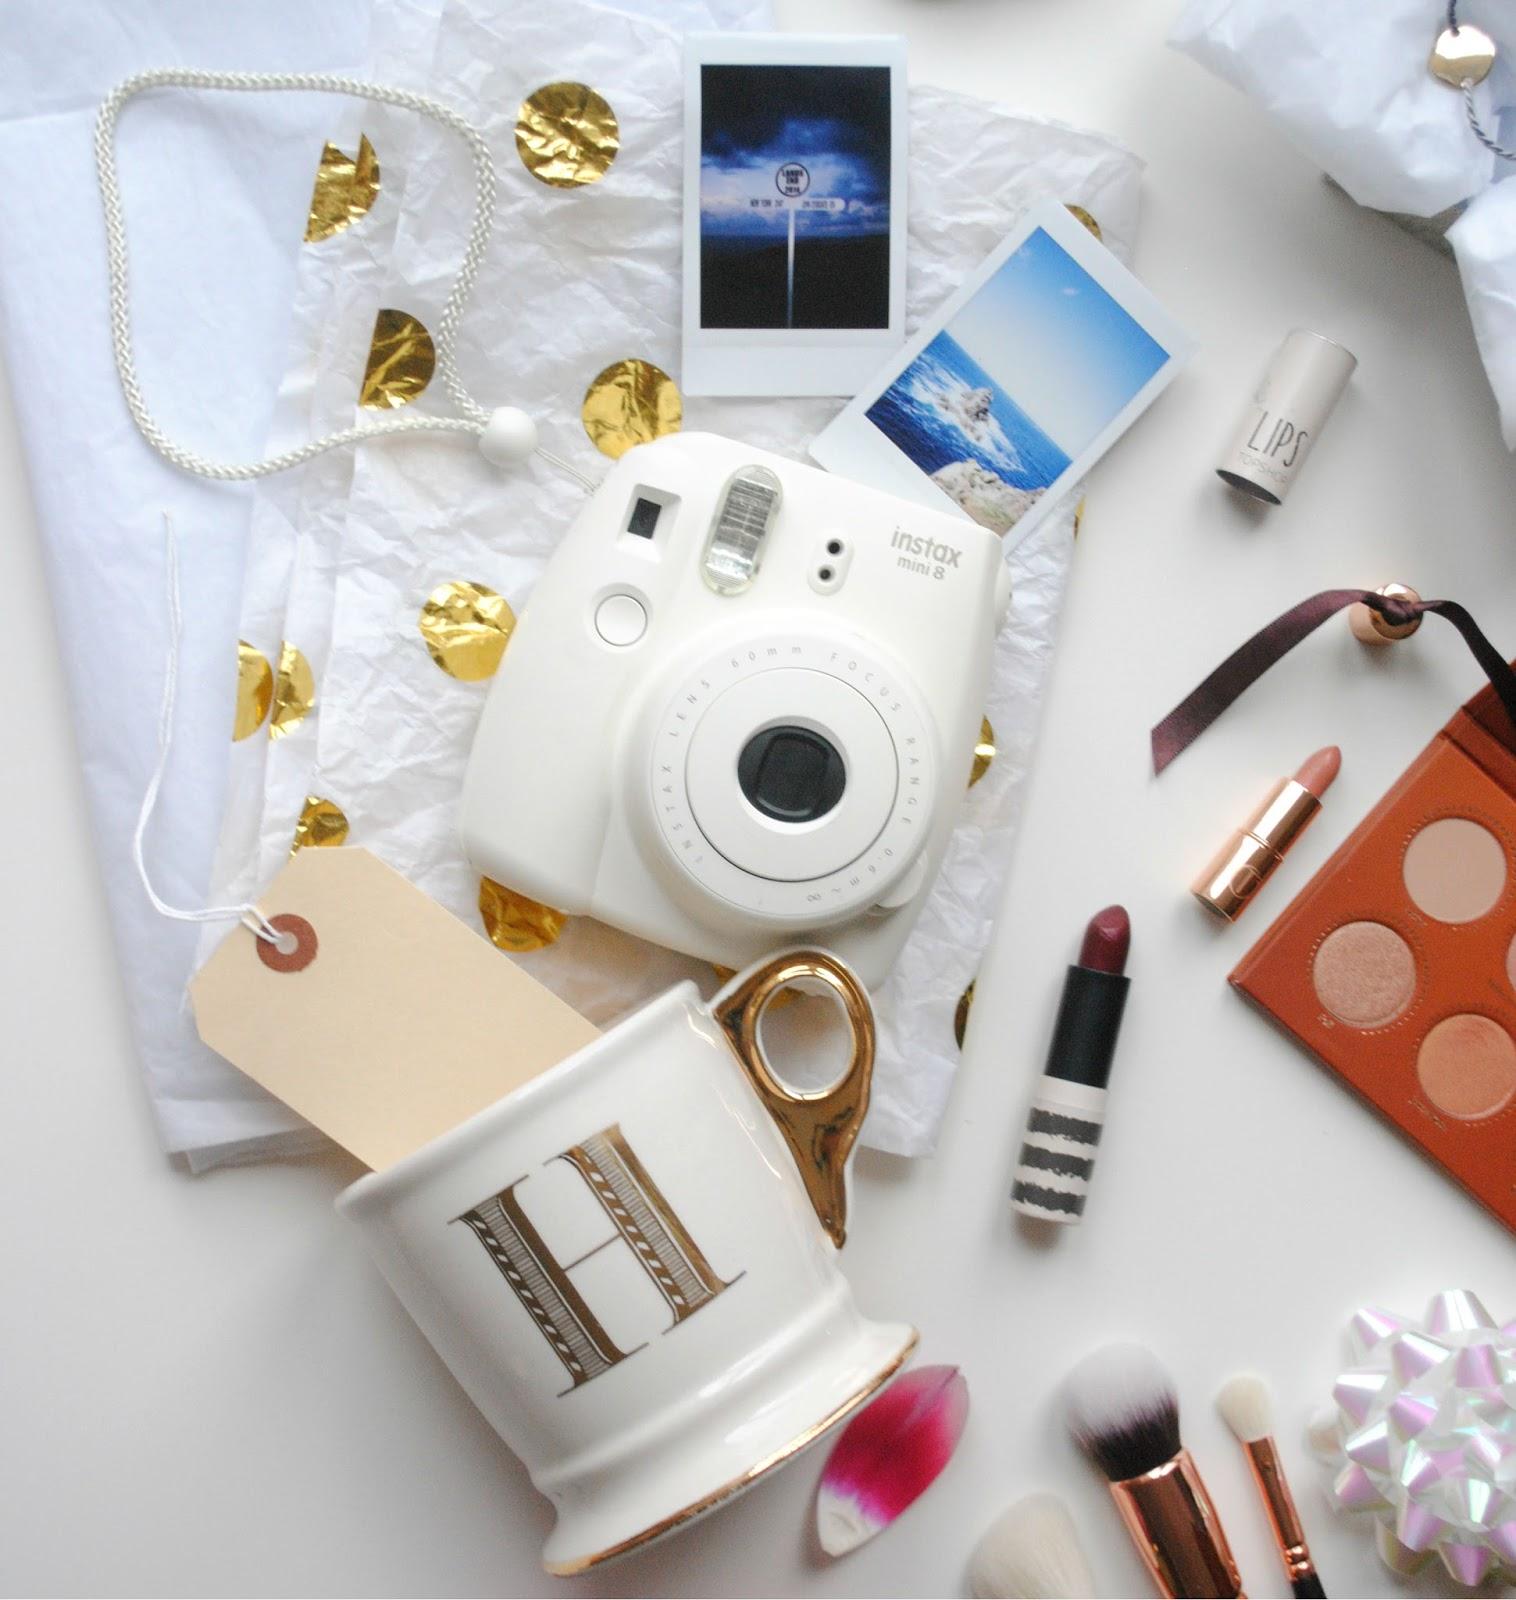 polaroid camera gold polka dots topshop lipstick charlotte tilbury rose gold zoeva